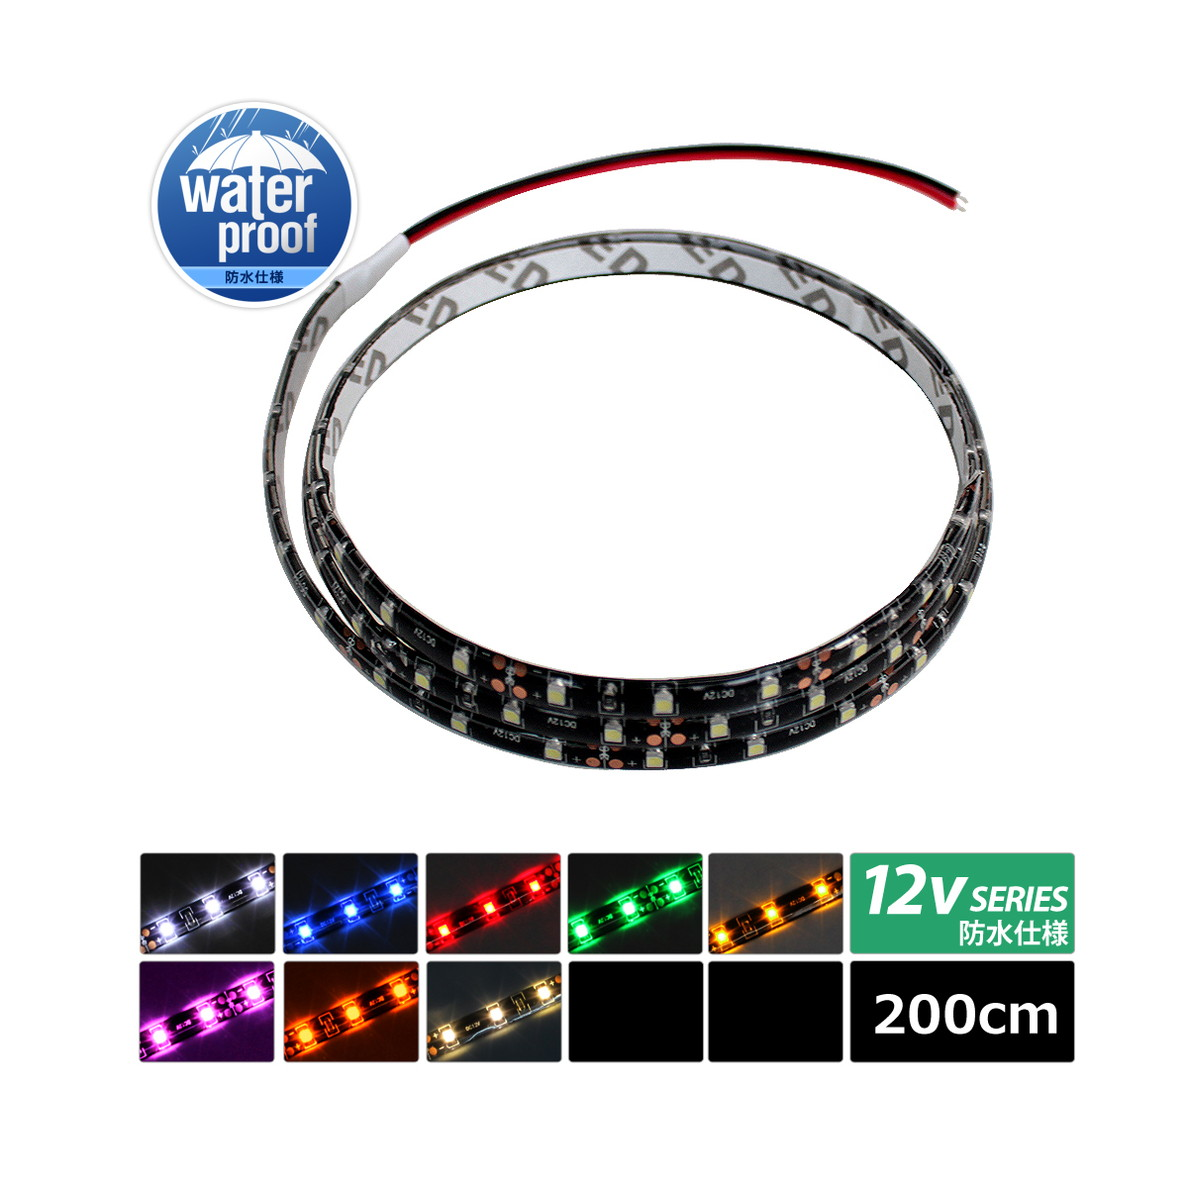 [200cm×1本] 超安12V 防水 LEDテープライト 1チップ 200cm [黒ベース | ケーブル12cm]